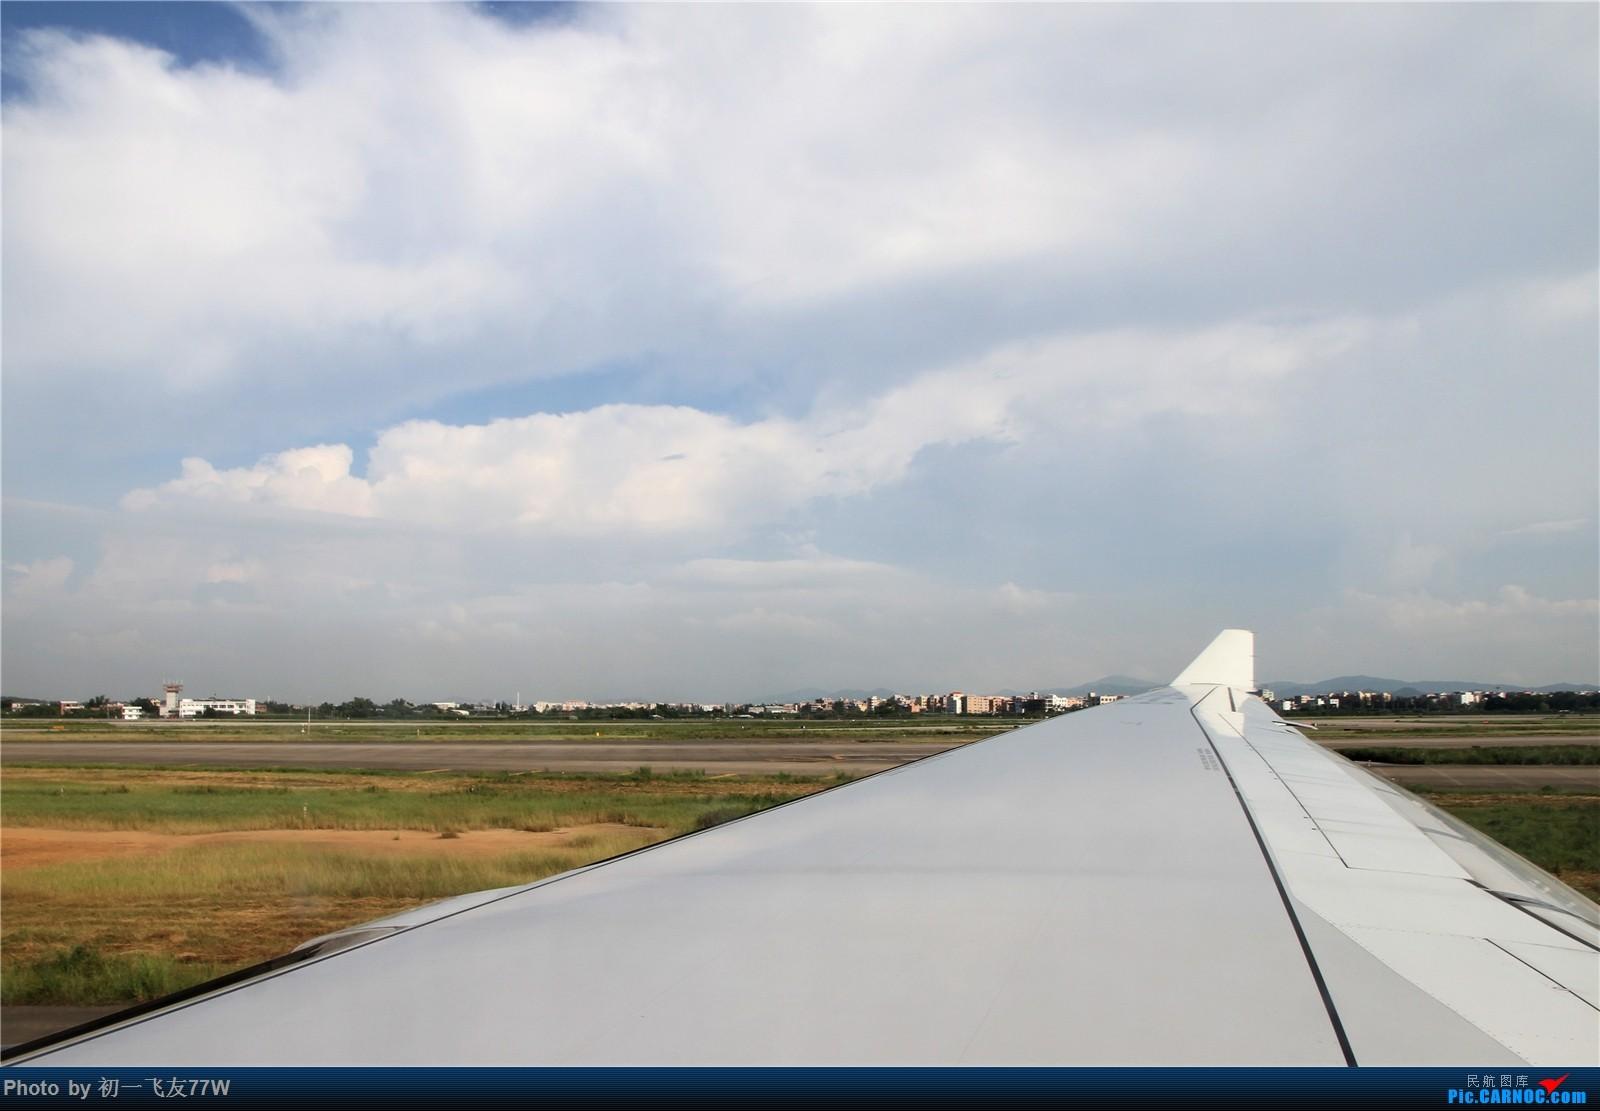 Re:[原创]【小吕游记第二季】马尔代夫往返,DHC-6水上飞机体验 BOEING 737-800 B-1917